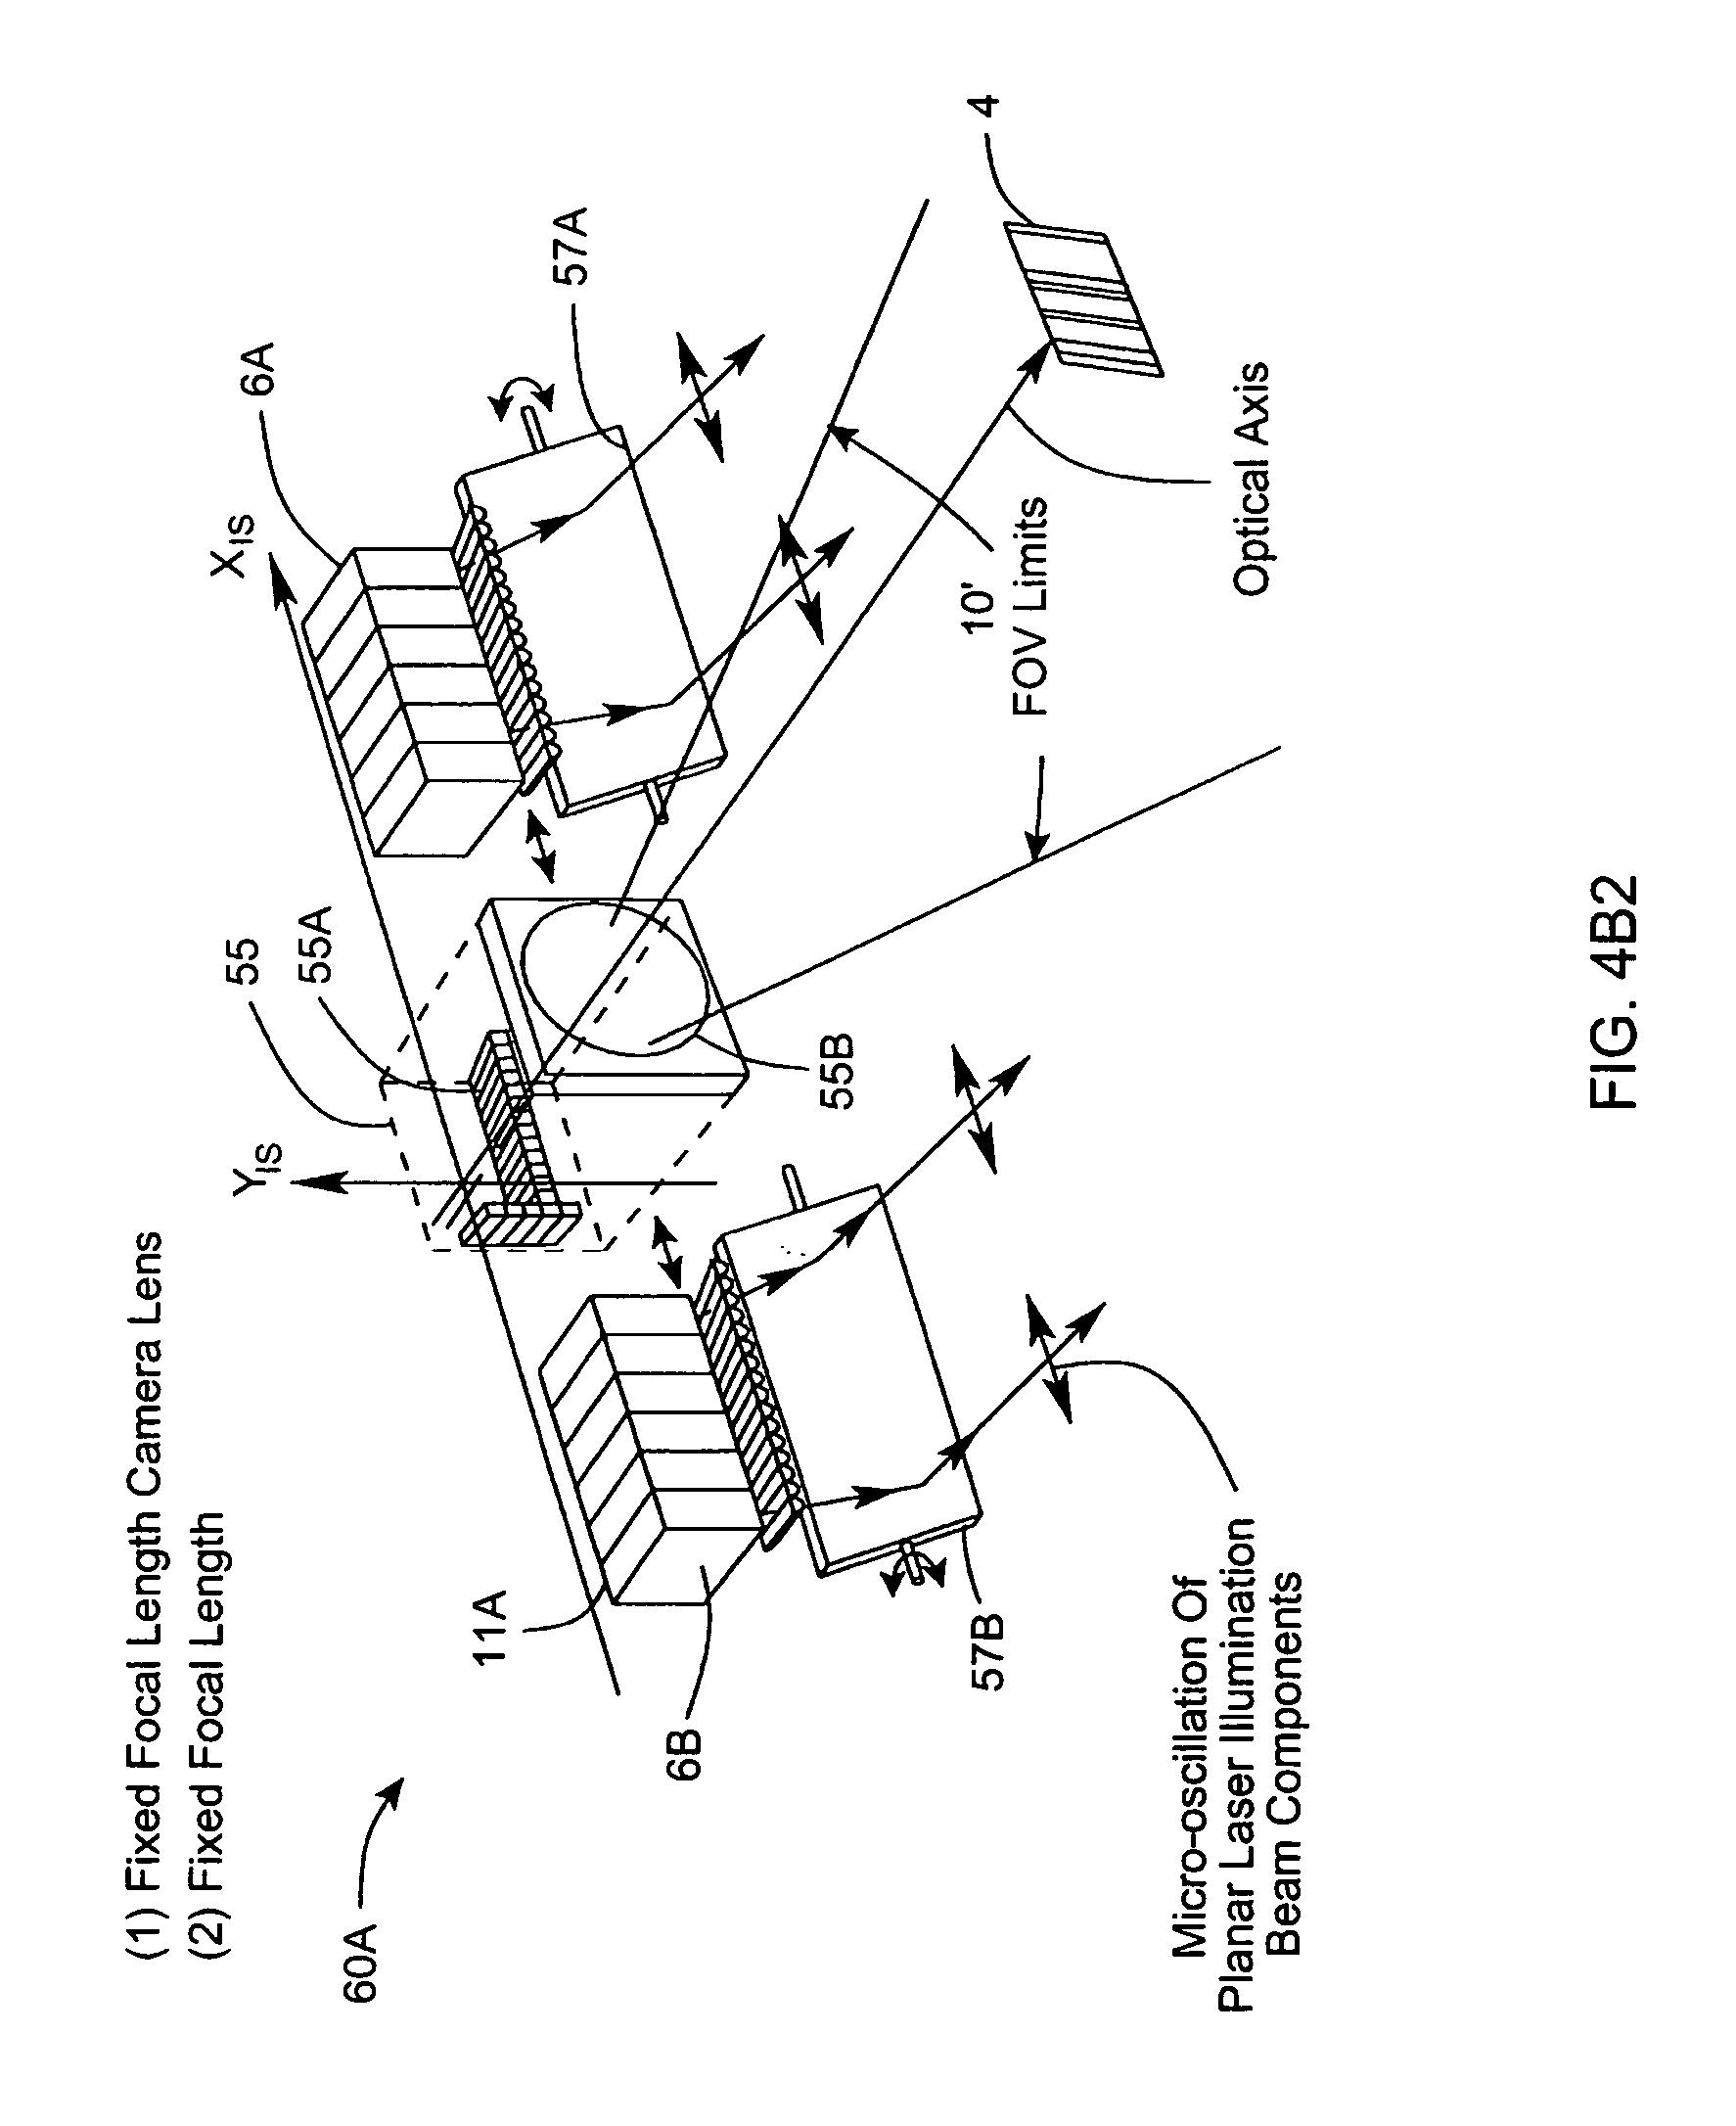 Patent US 7,527,202 B2